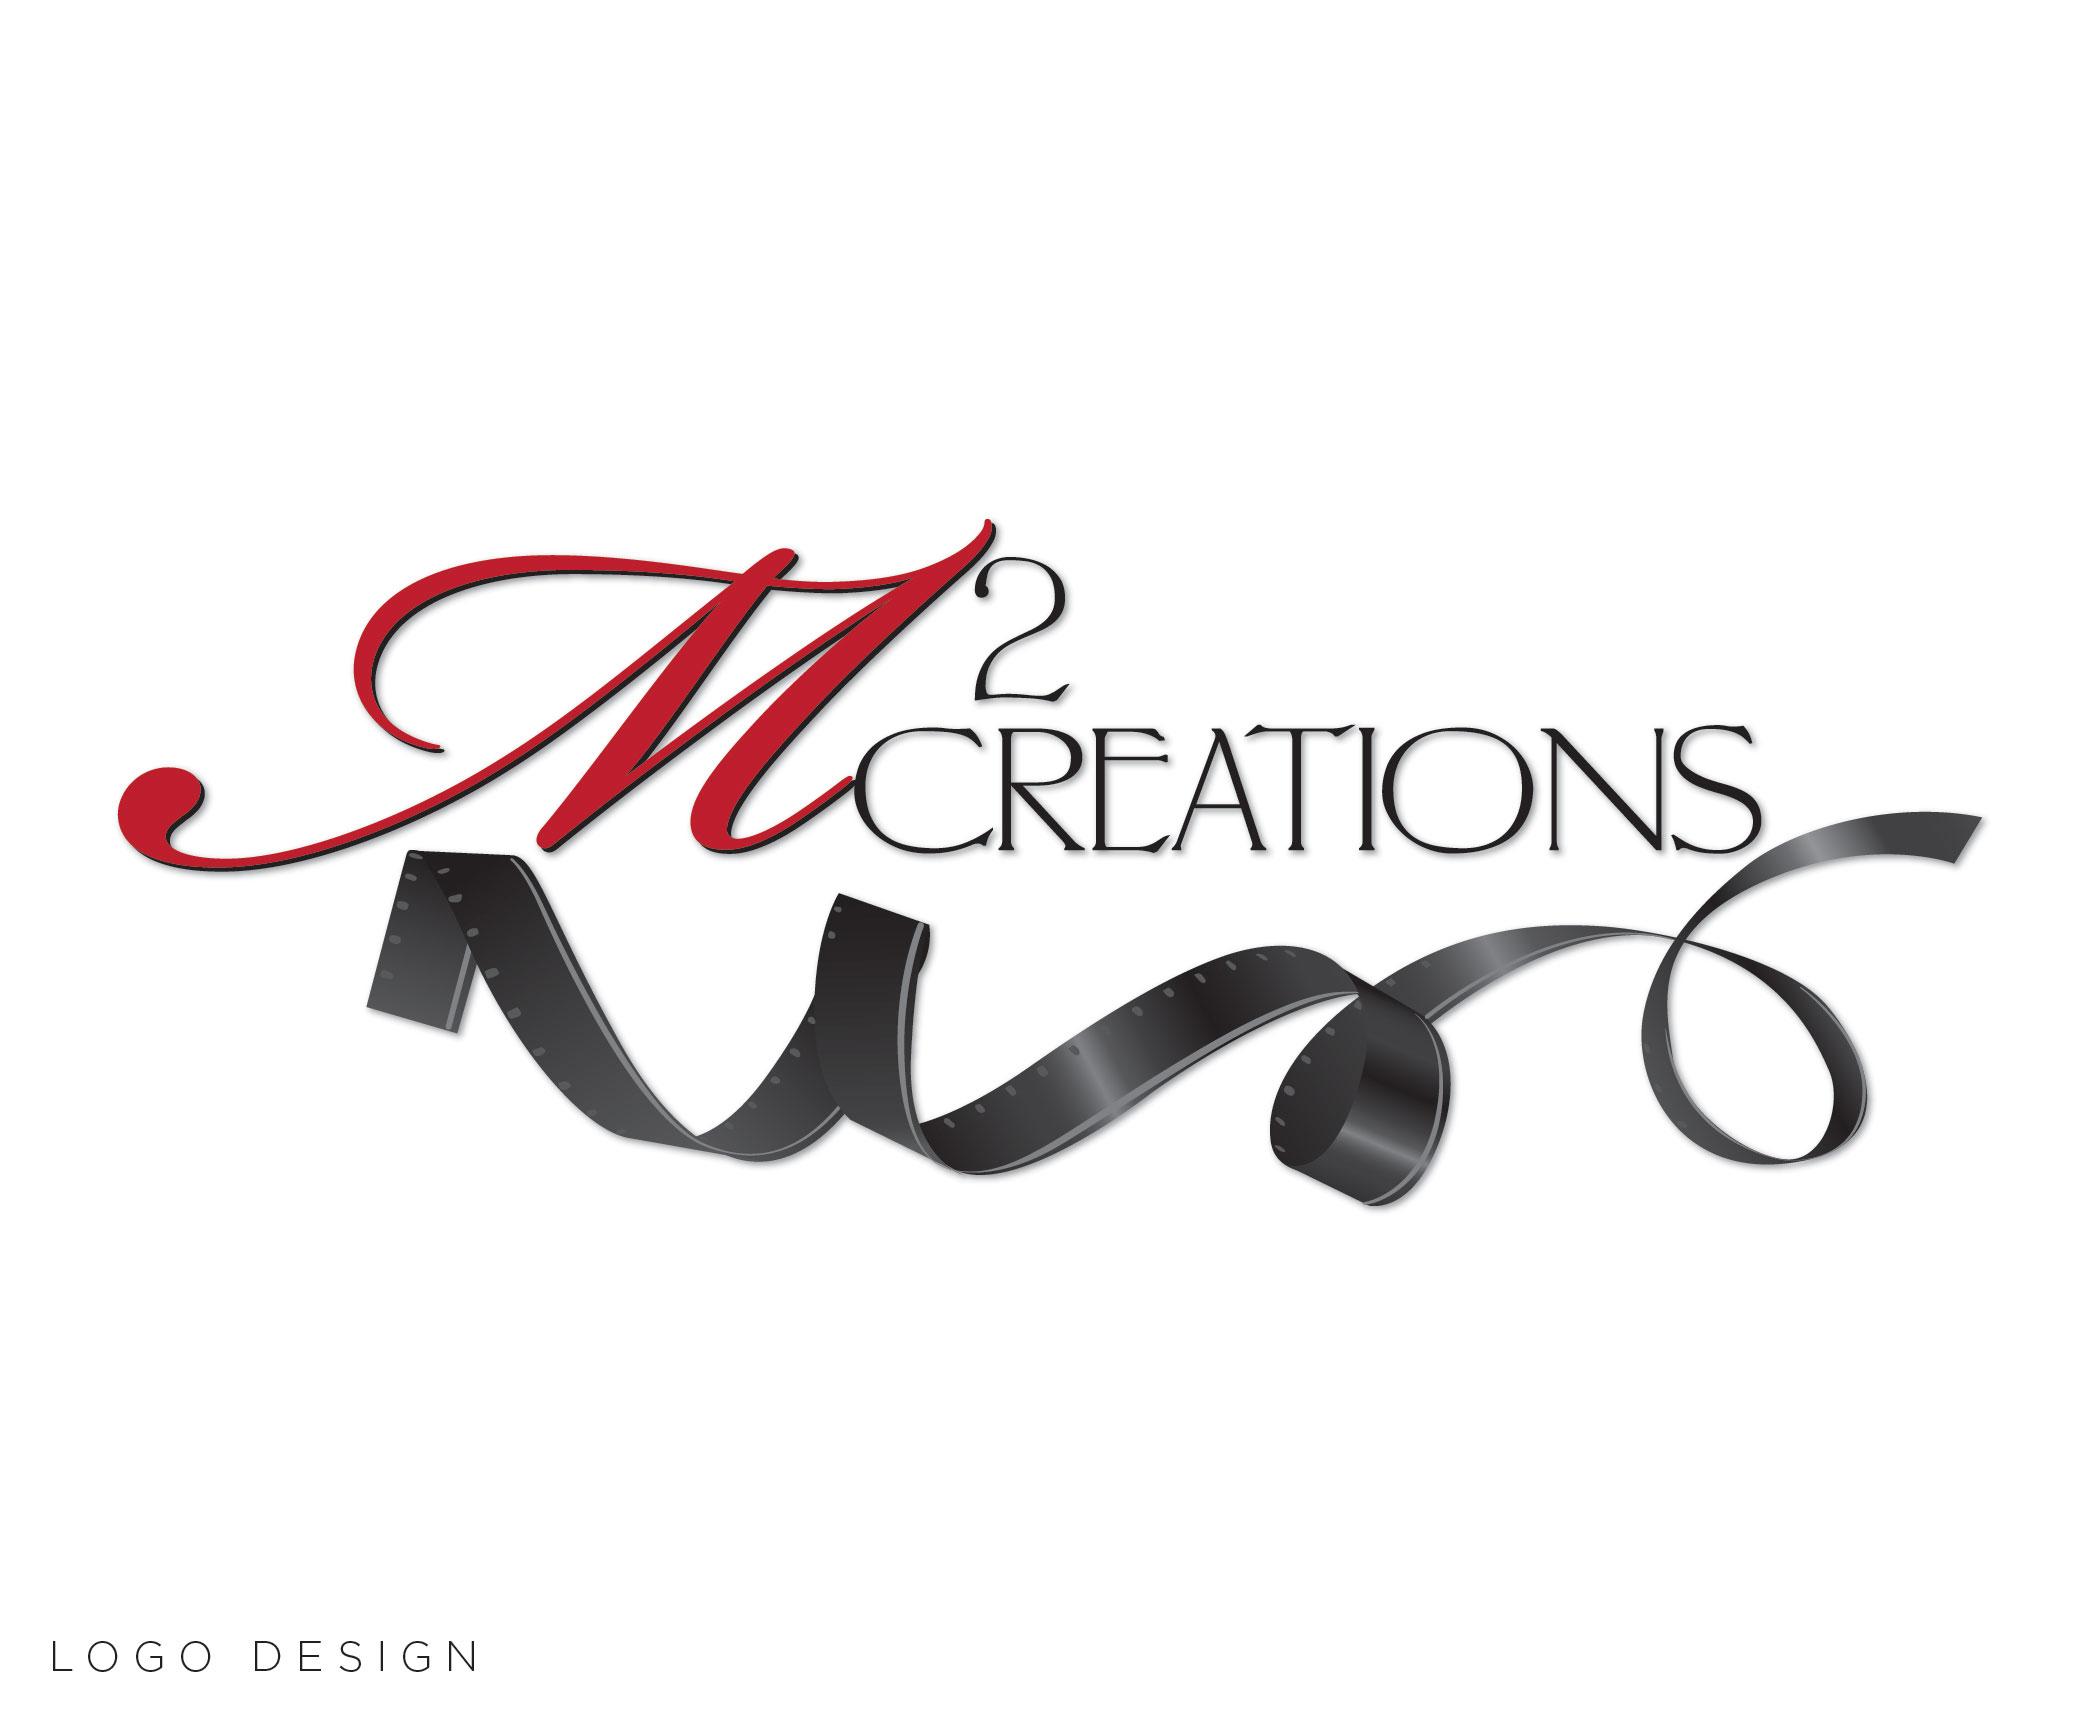 m2creations-01.jpg